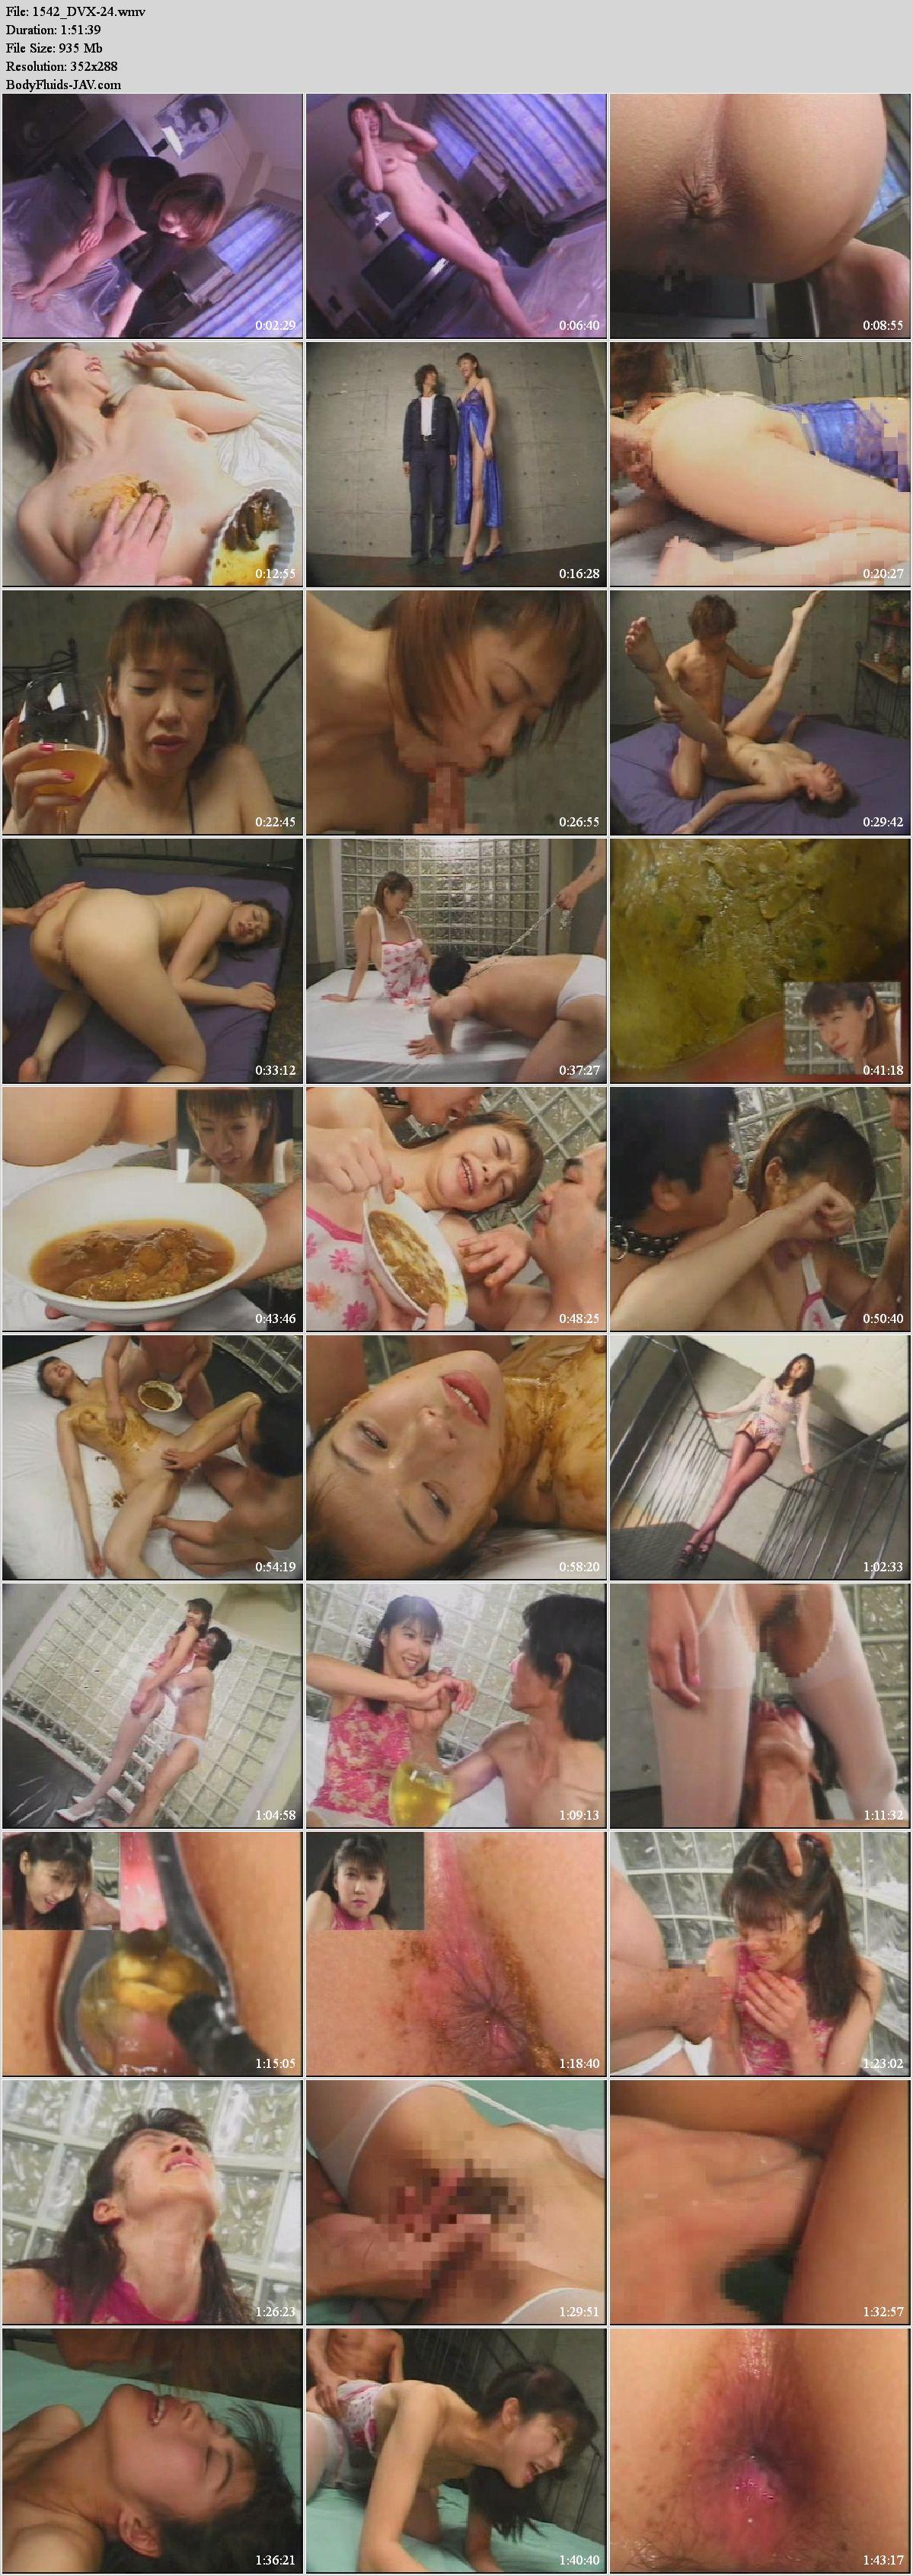 DVX-24 Kitagawa Yumika and Kuroda Makoto covered with feces and coprophagy sex.